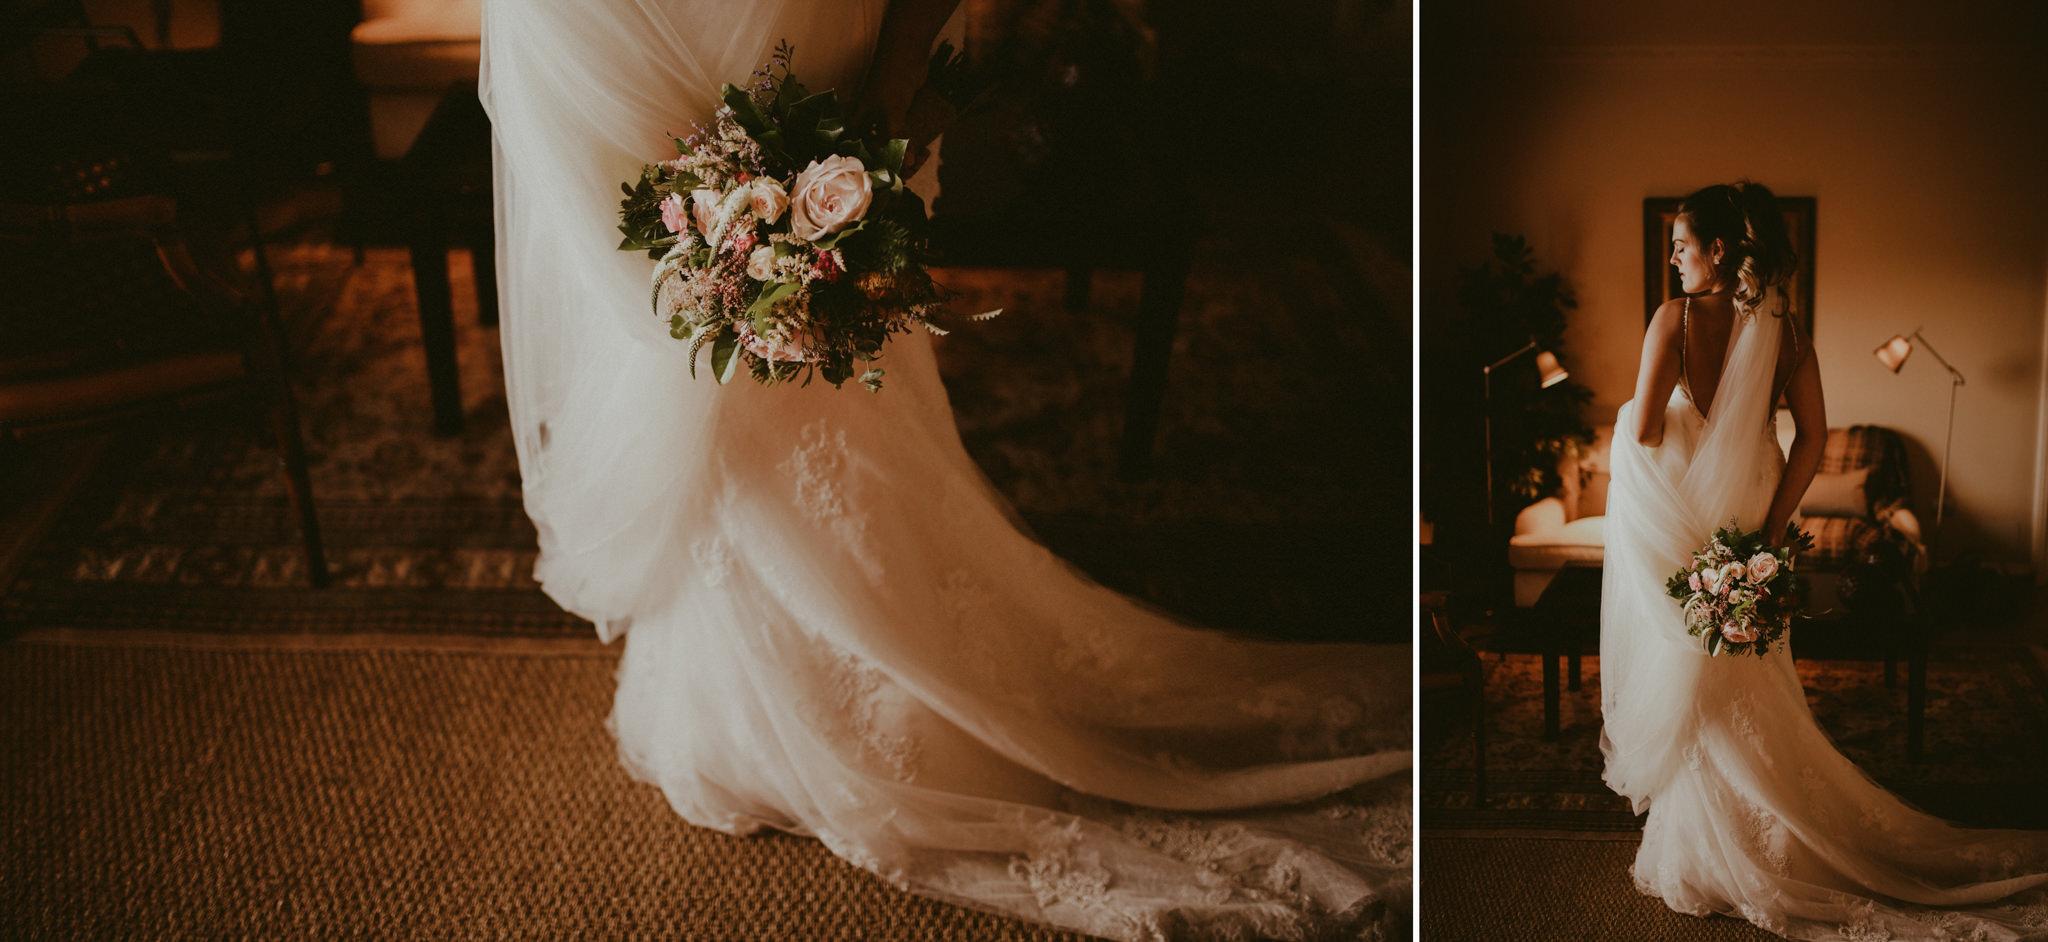 boda-diferente-fotografo-boda-laspalmas-grancanaria-110